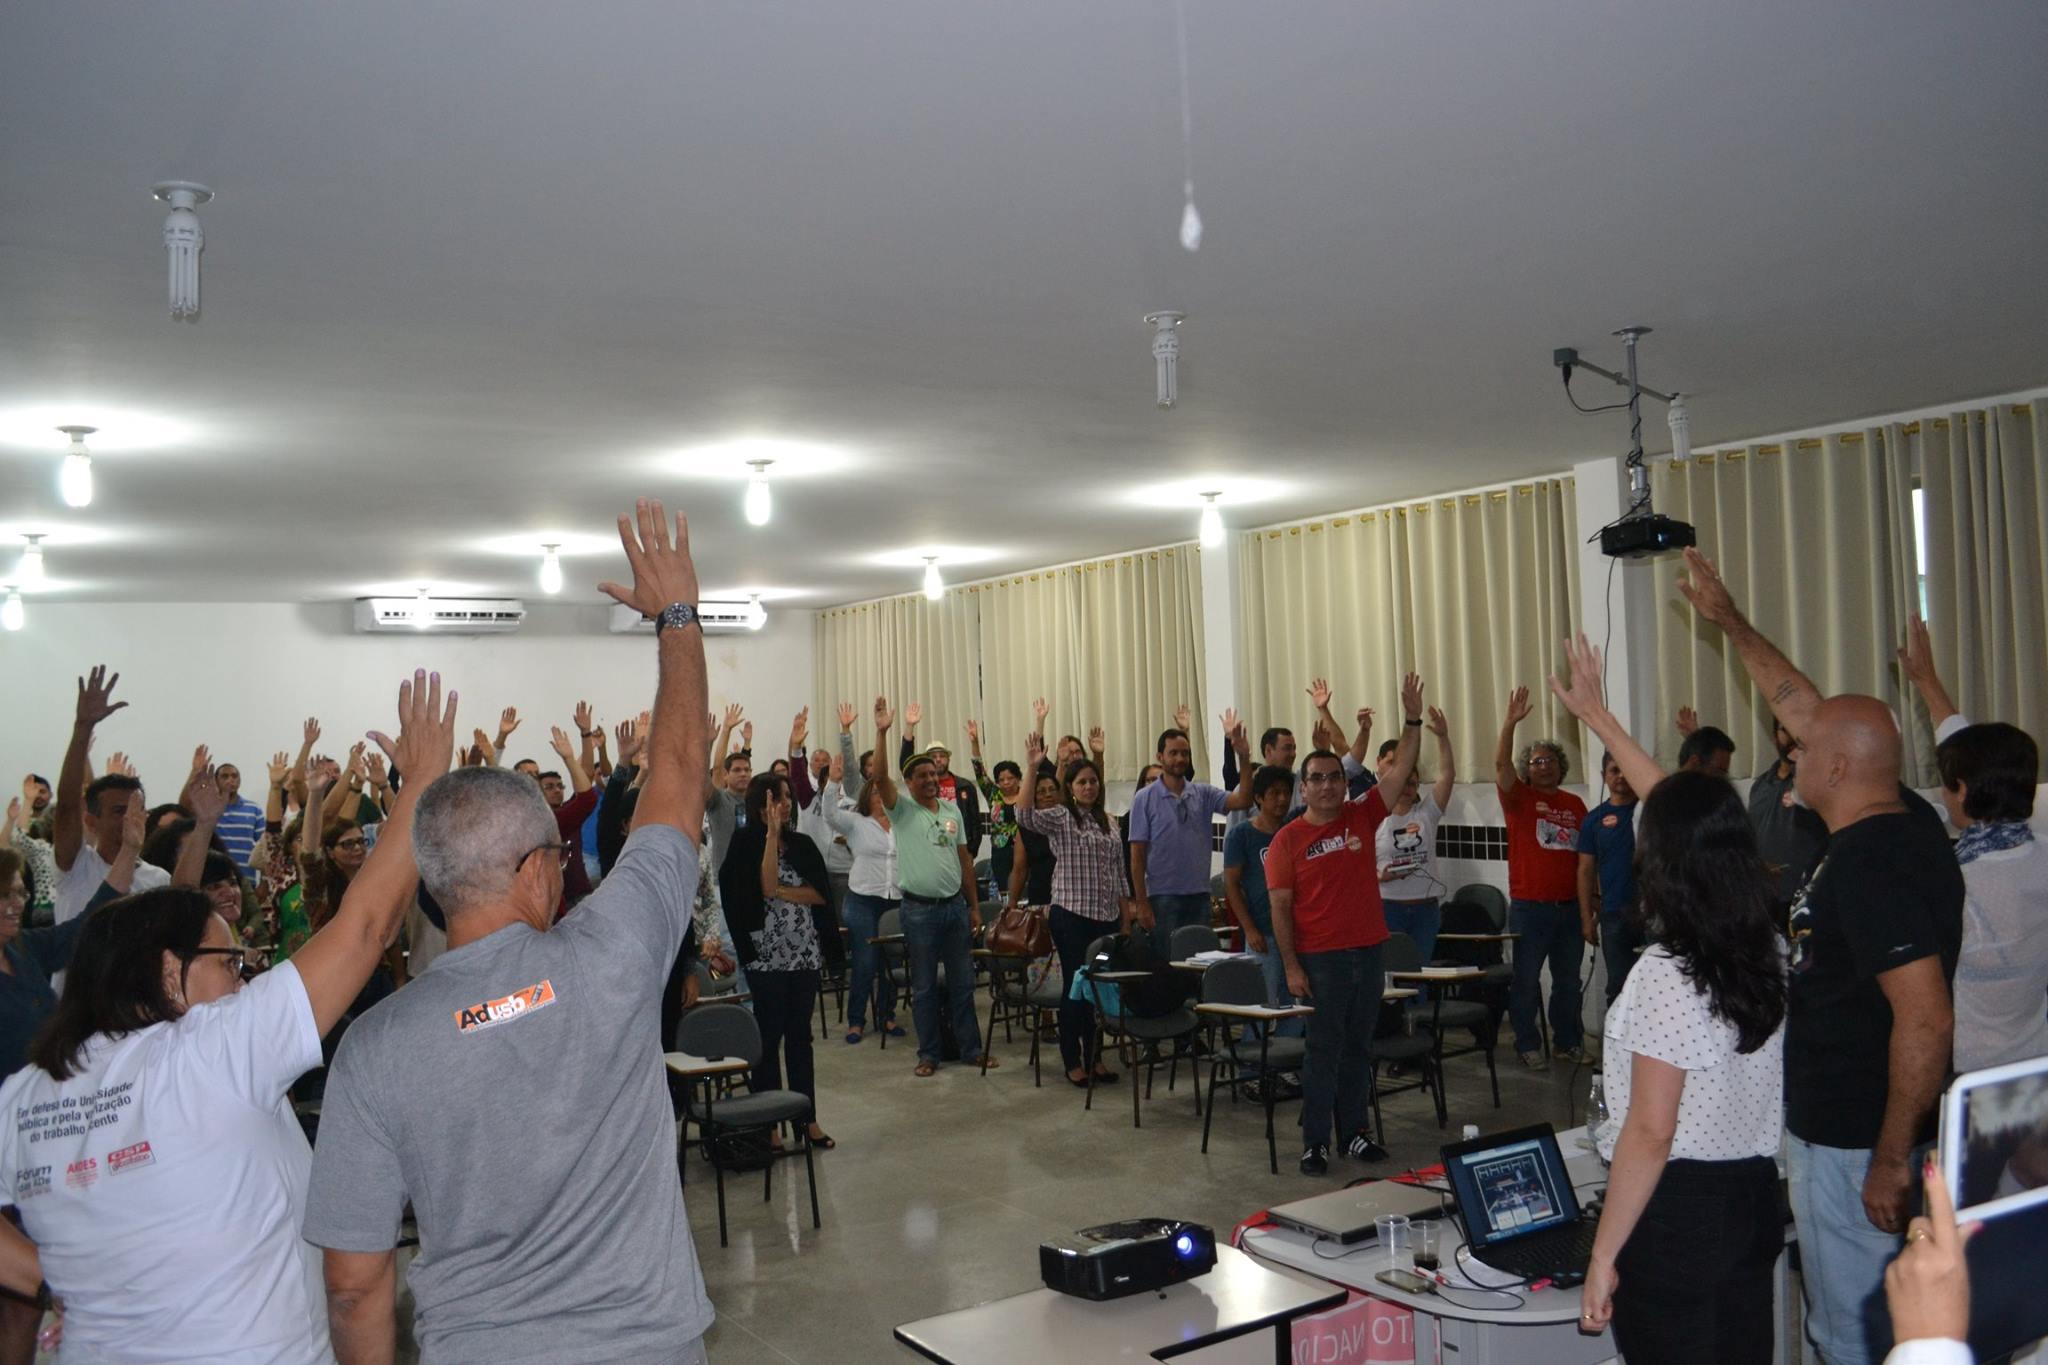 Assembleia mantém greve na UESB e reivindica ajustes na minuta de acordo